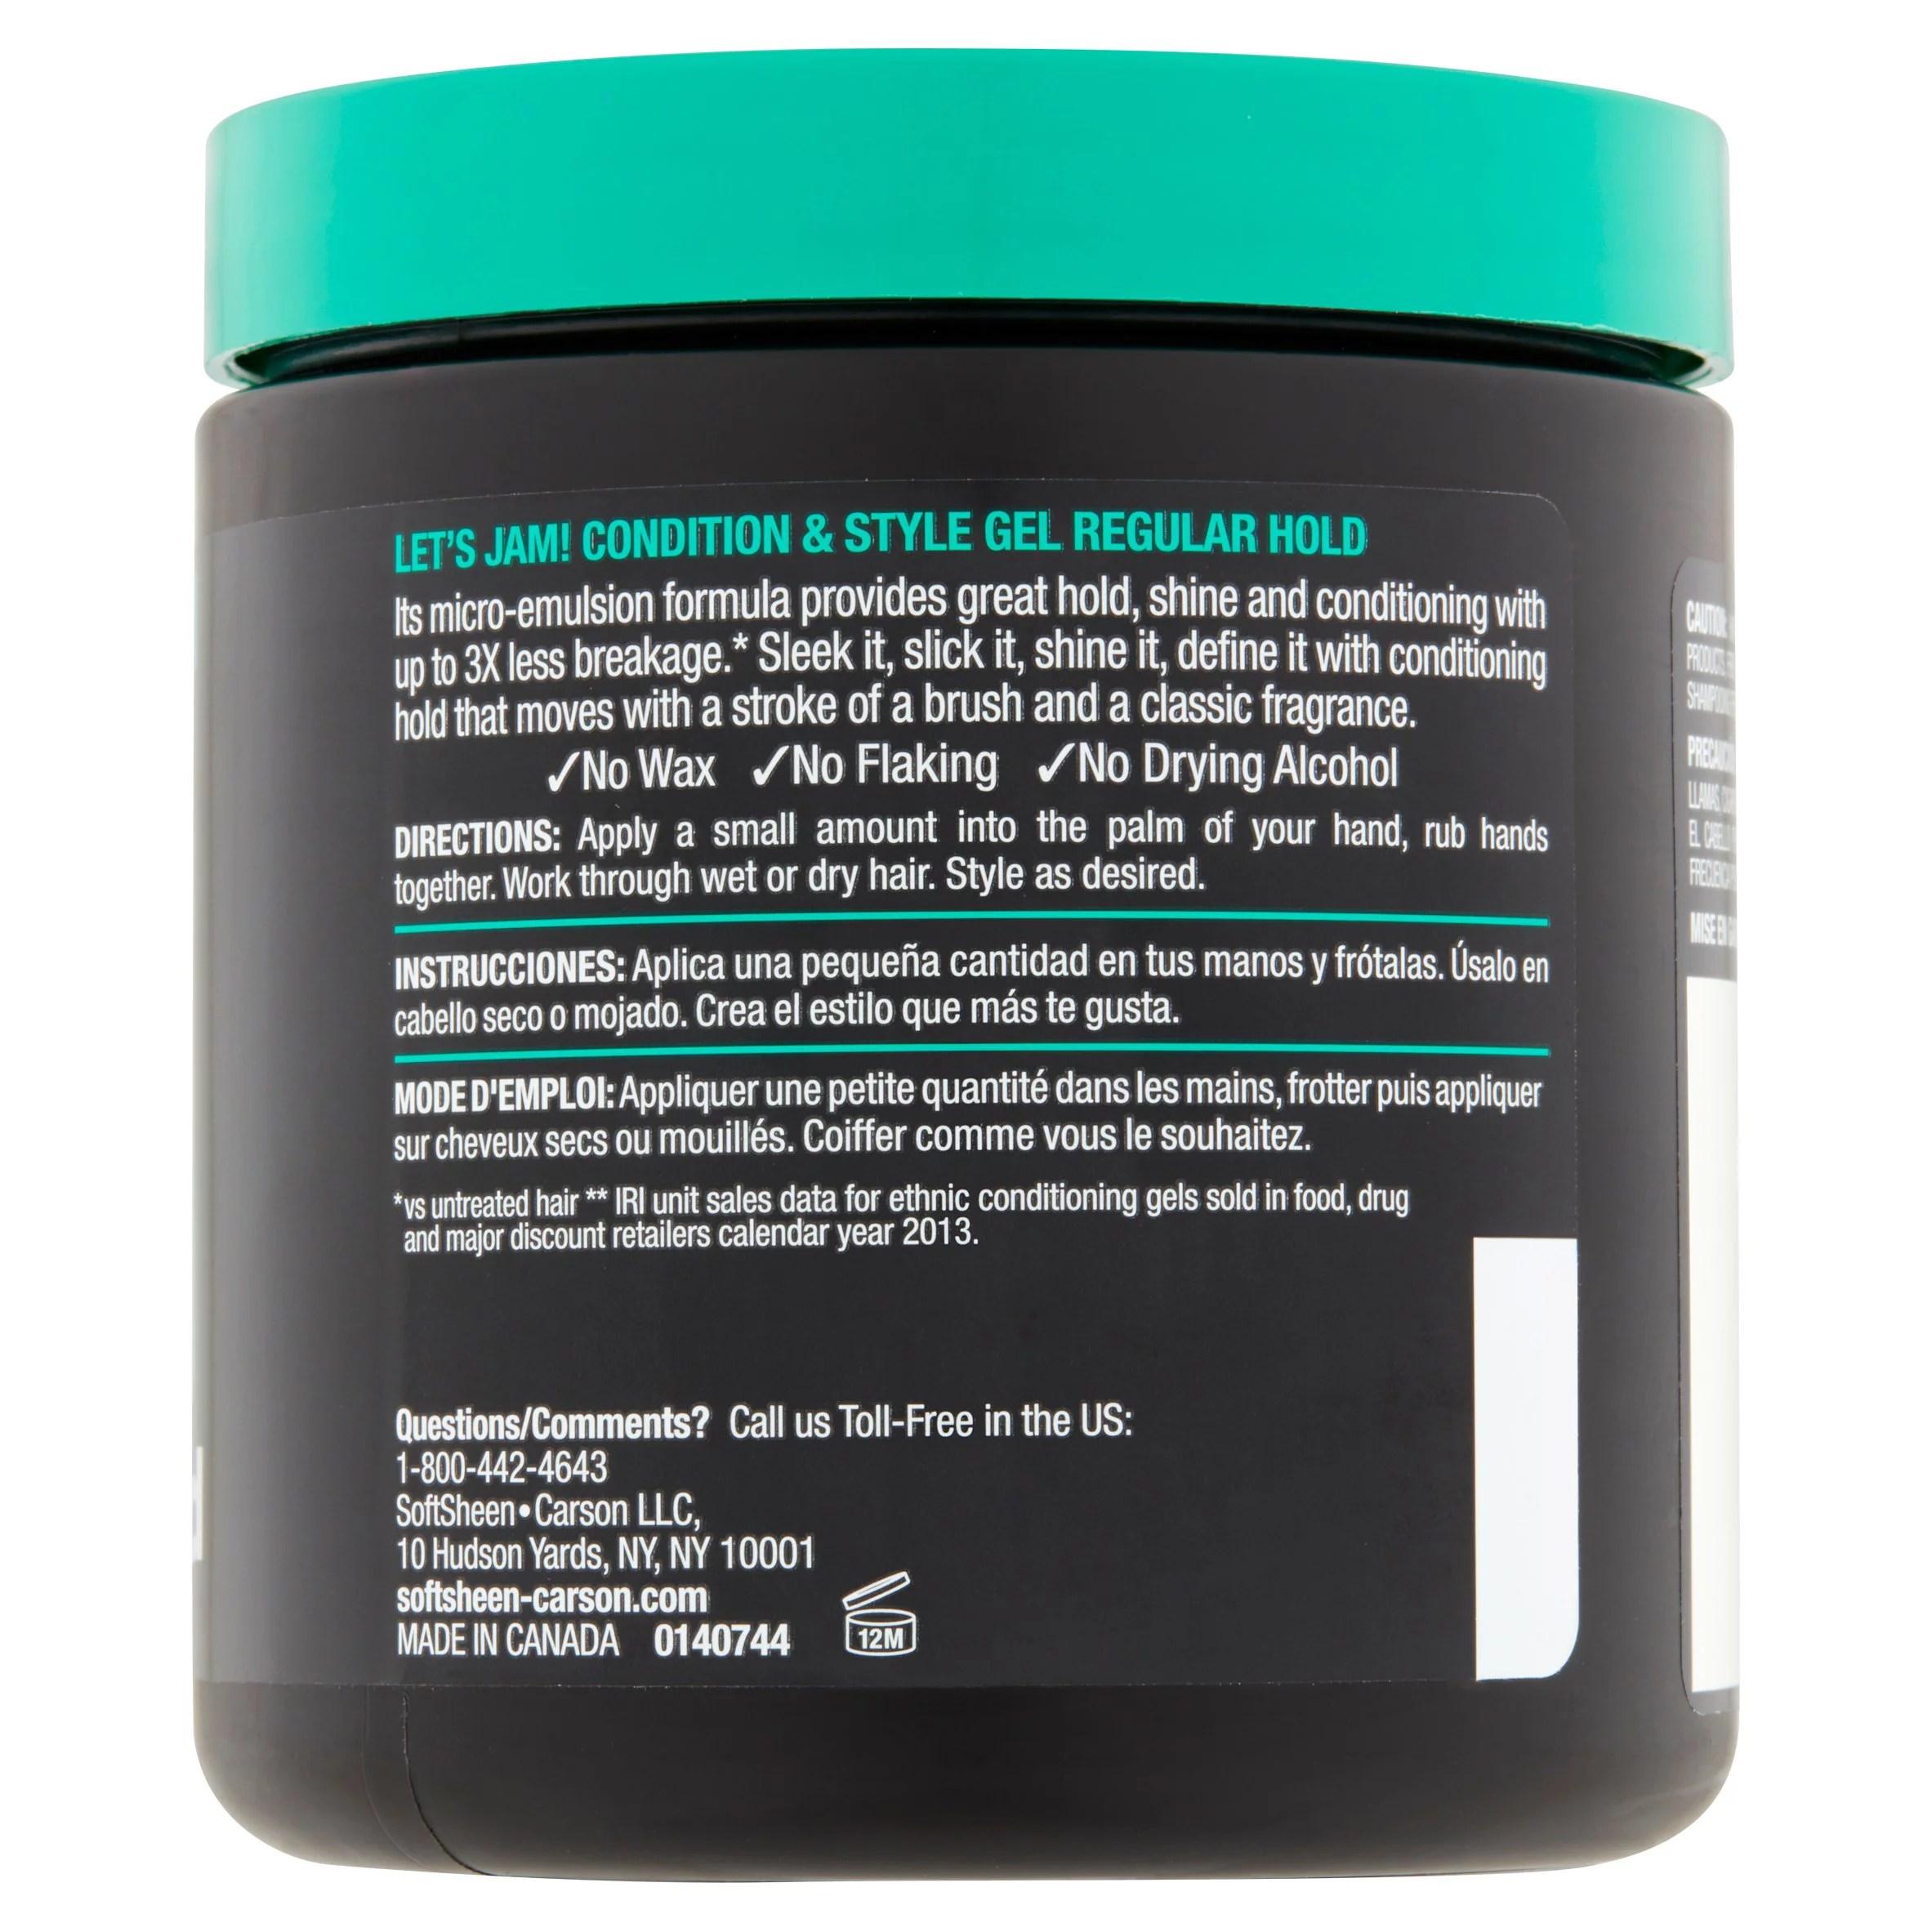 softsheen carson let s jam shining and conditioning gel regular hold walmart com